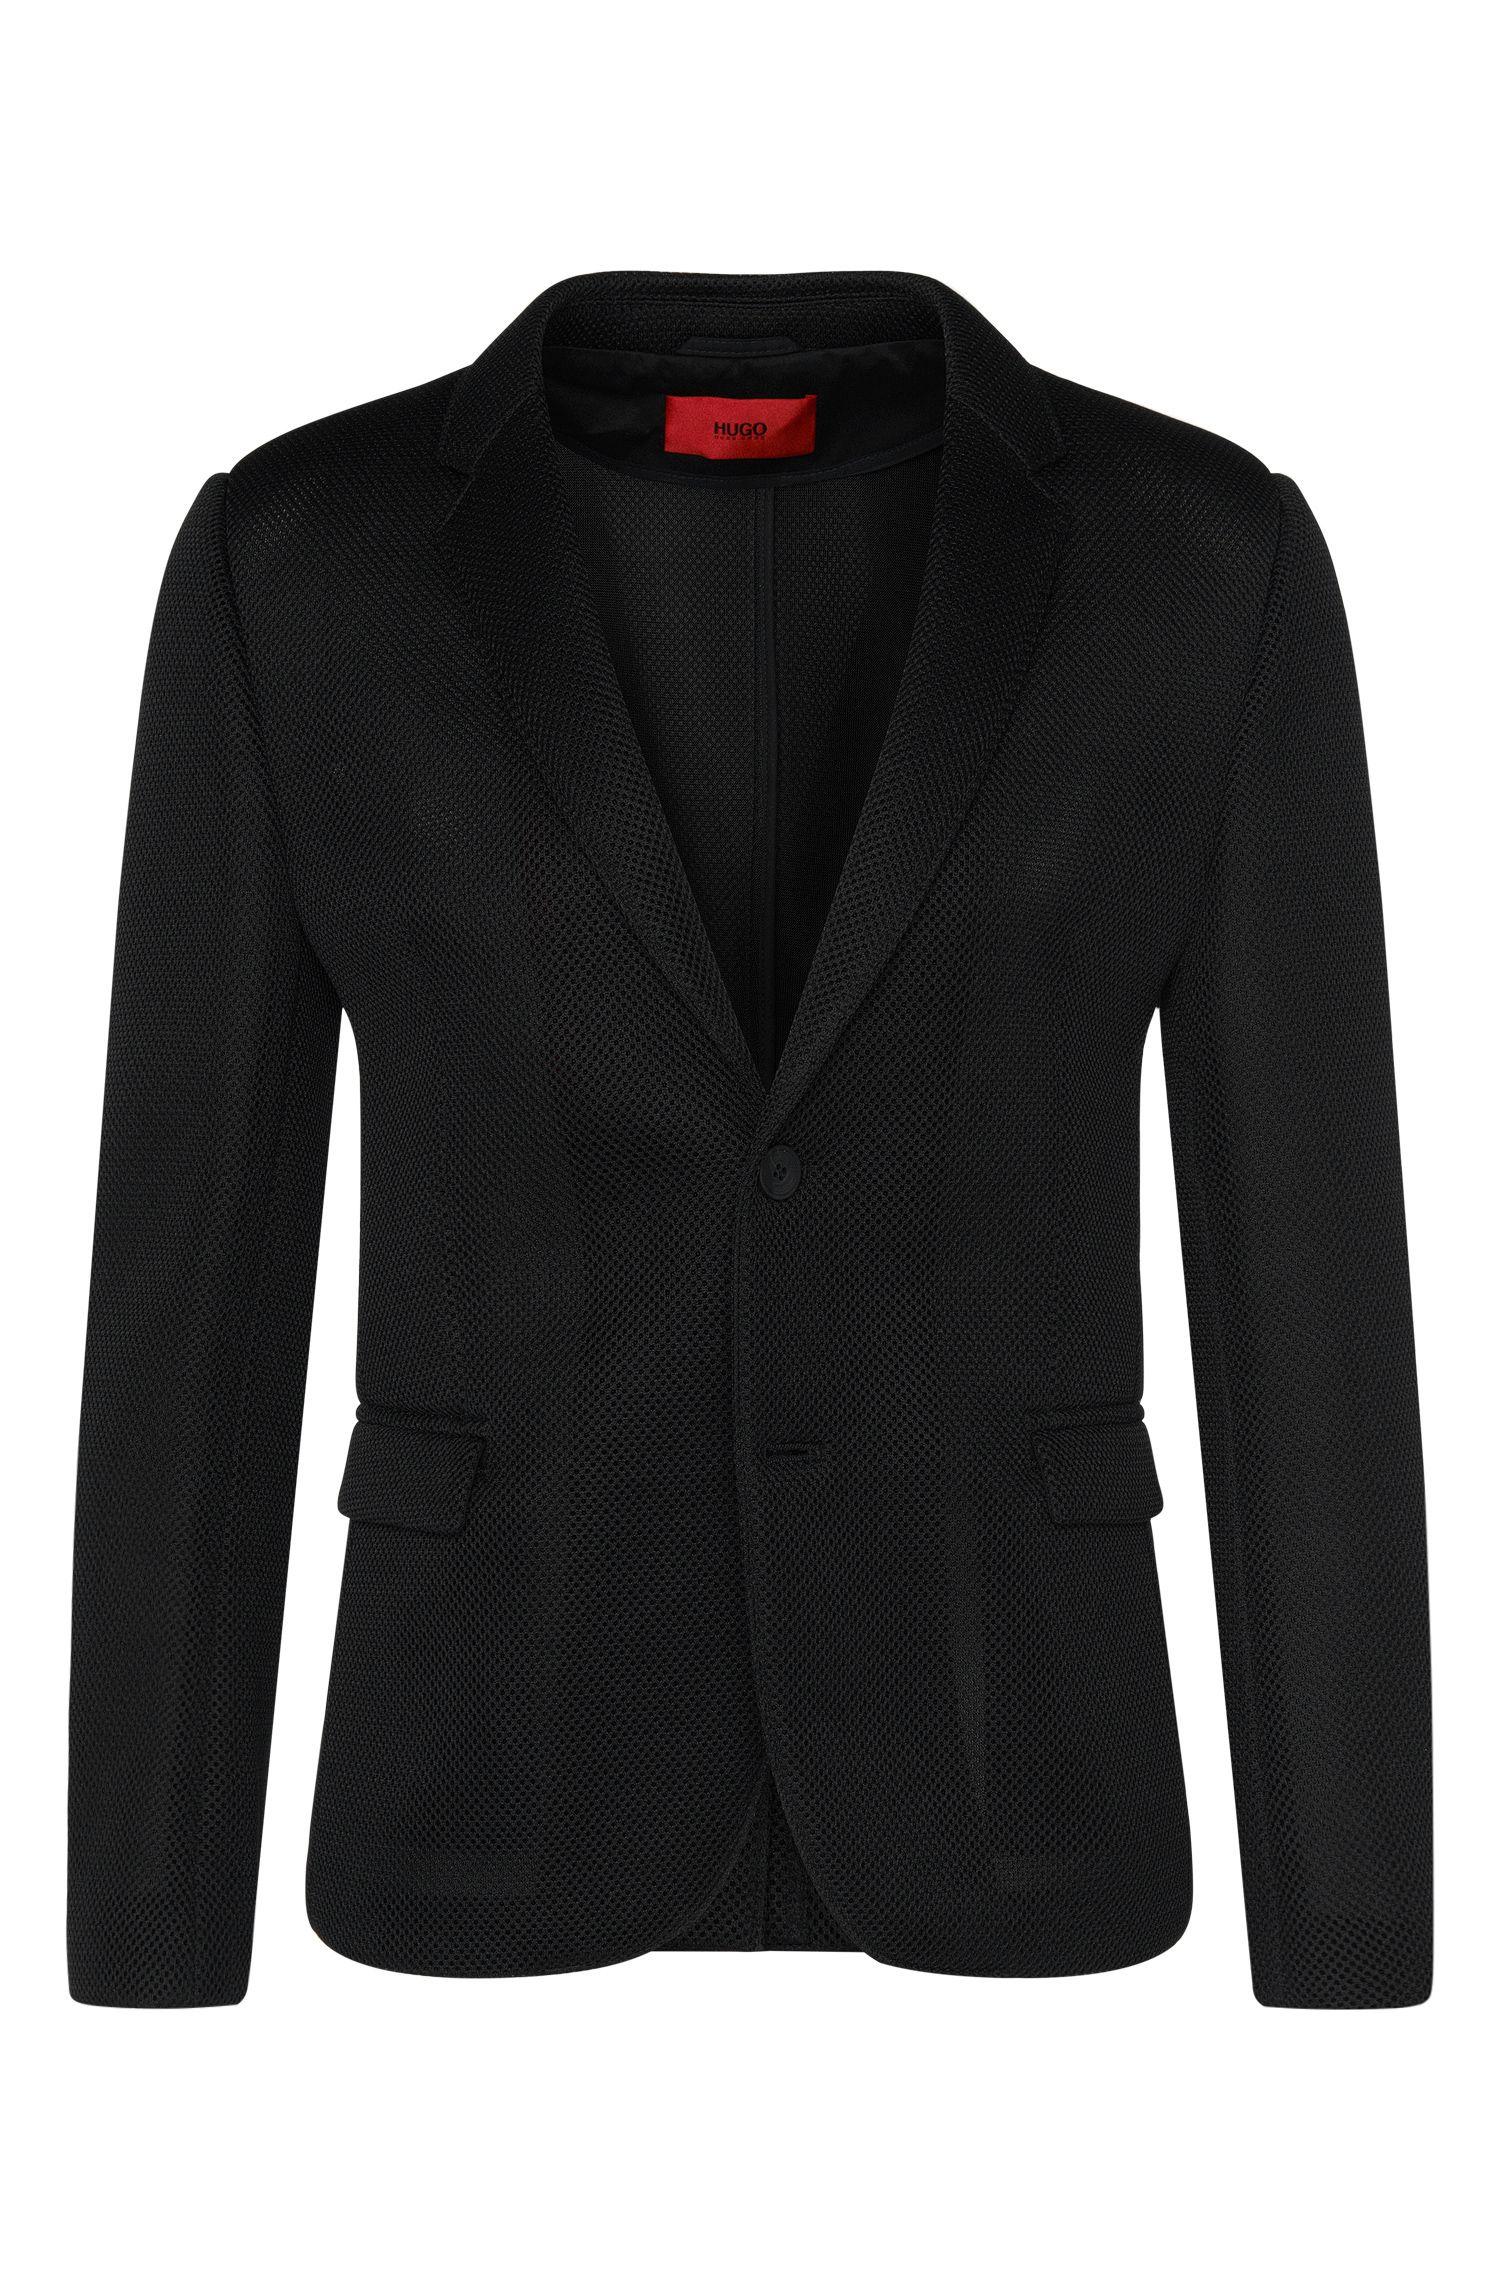 'Arwido' | Slim Fit, Mesh Overlay Sport Coat